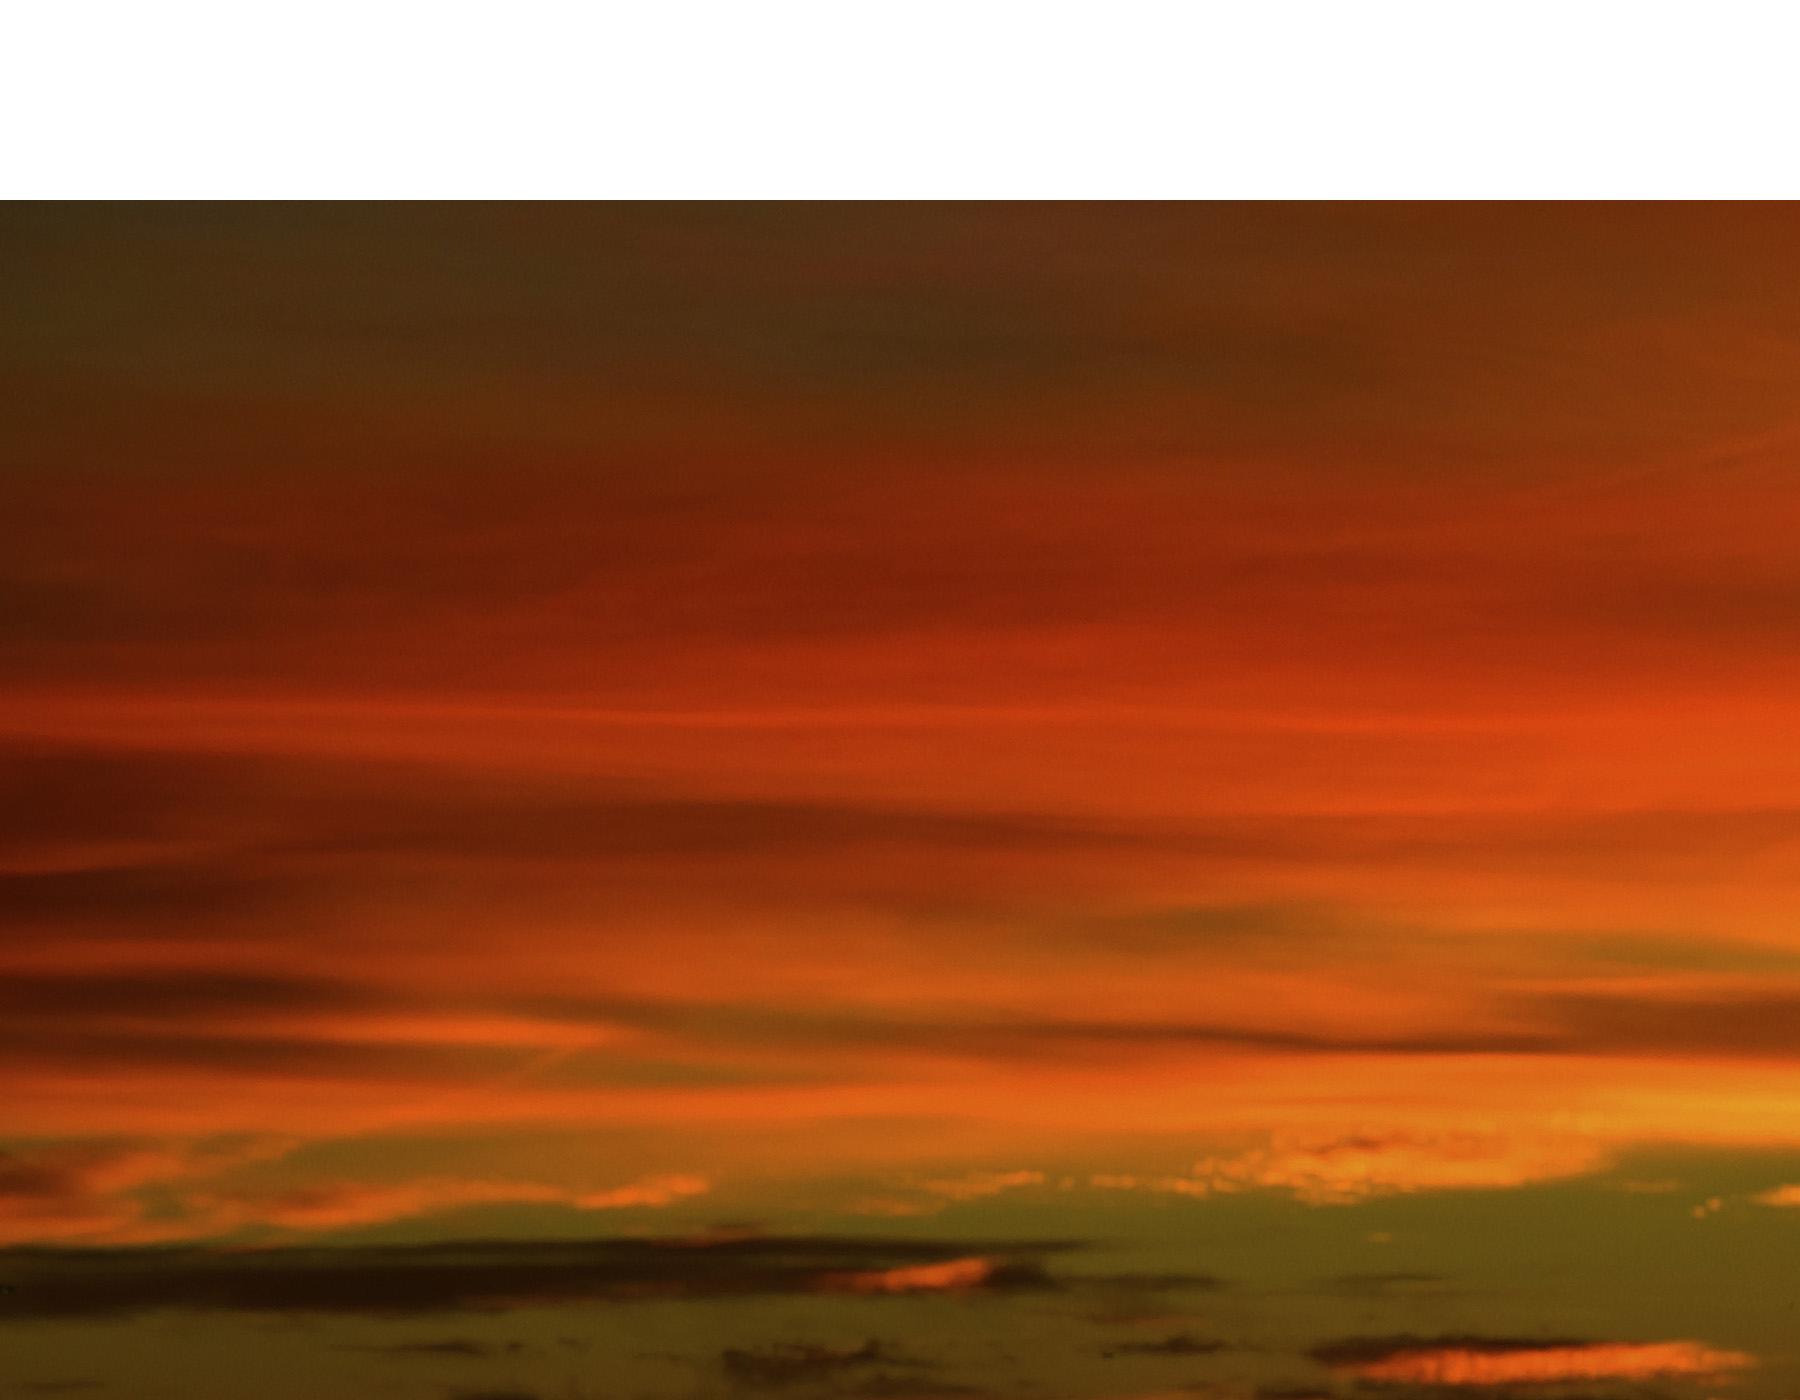 sunrise-abstract-f